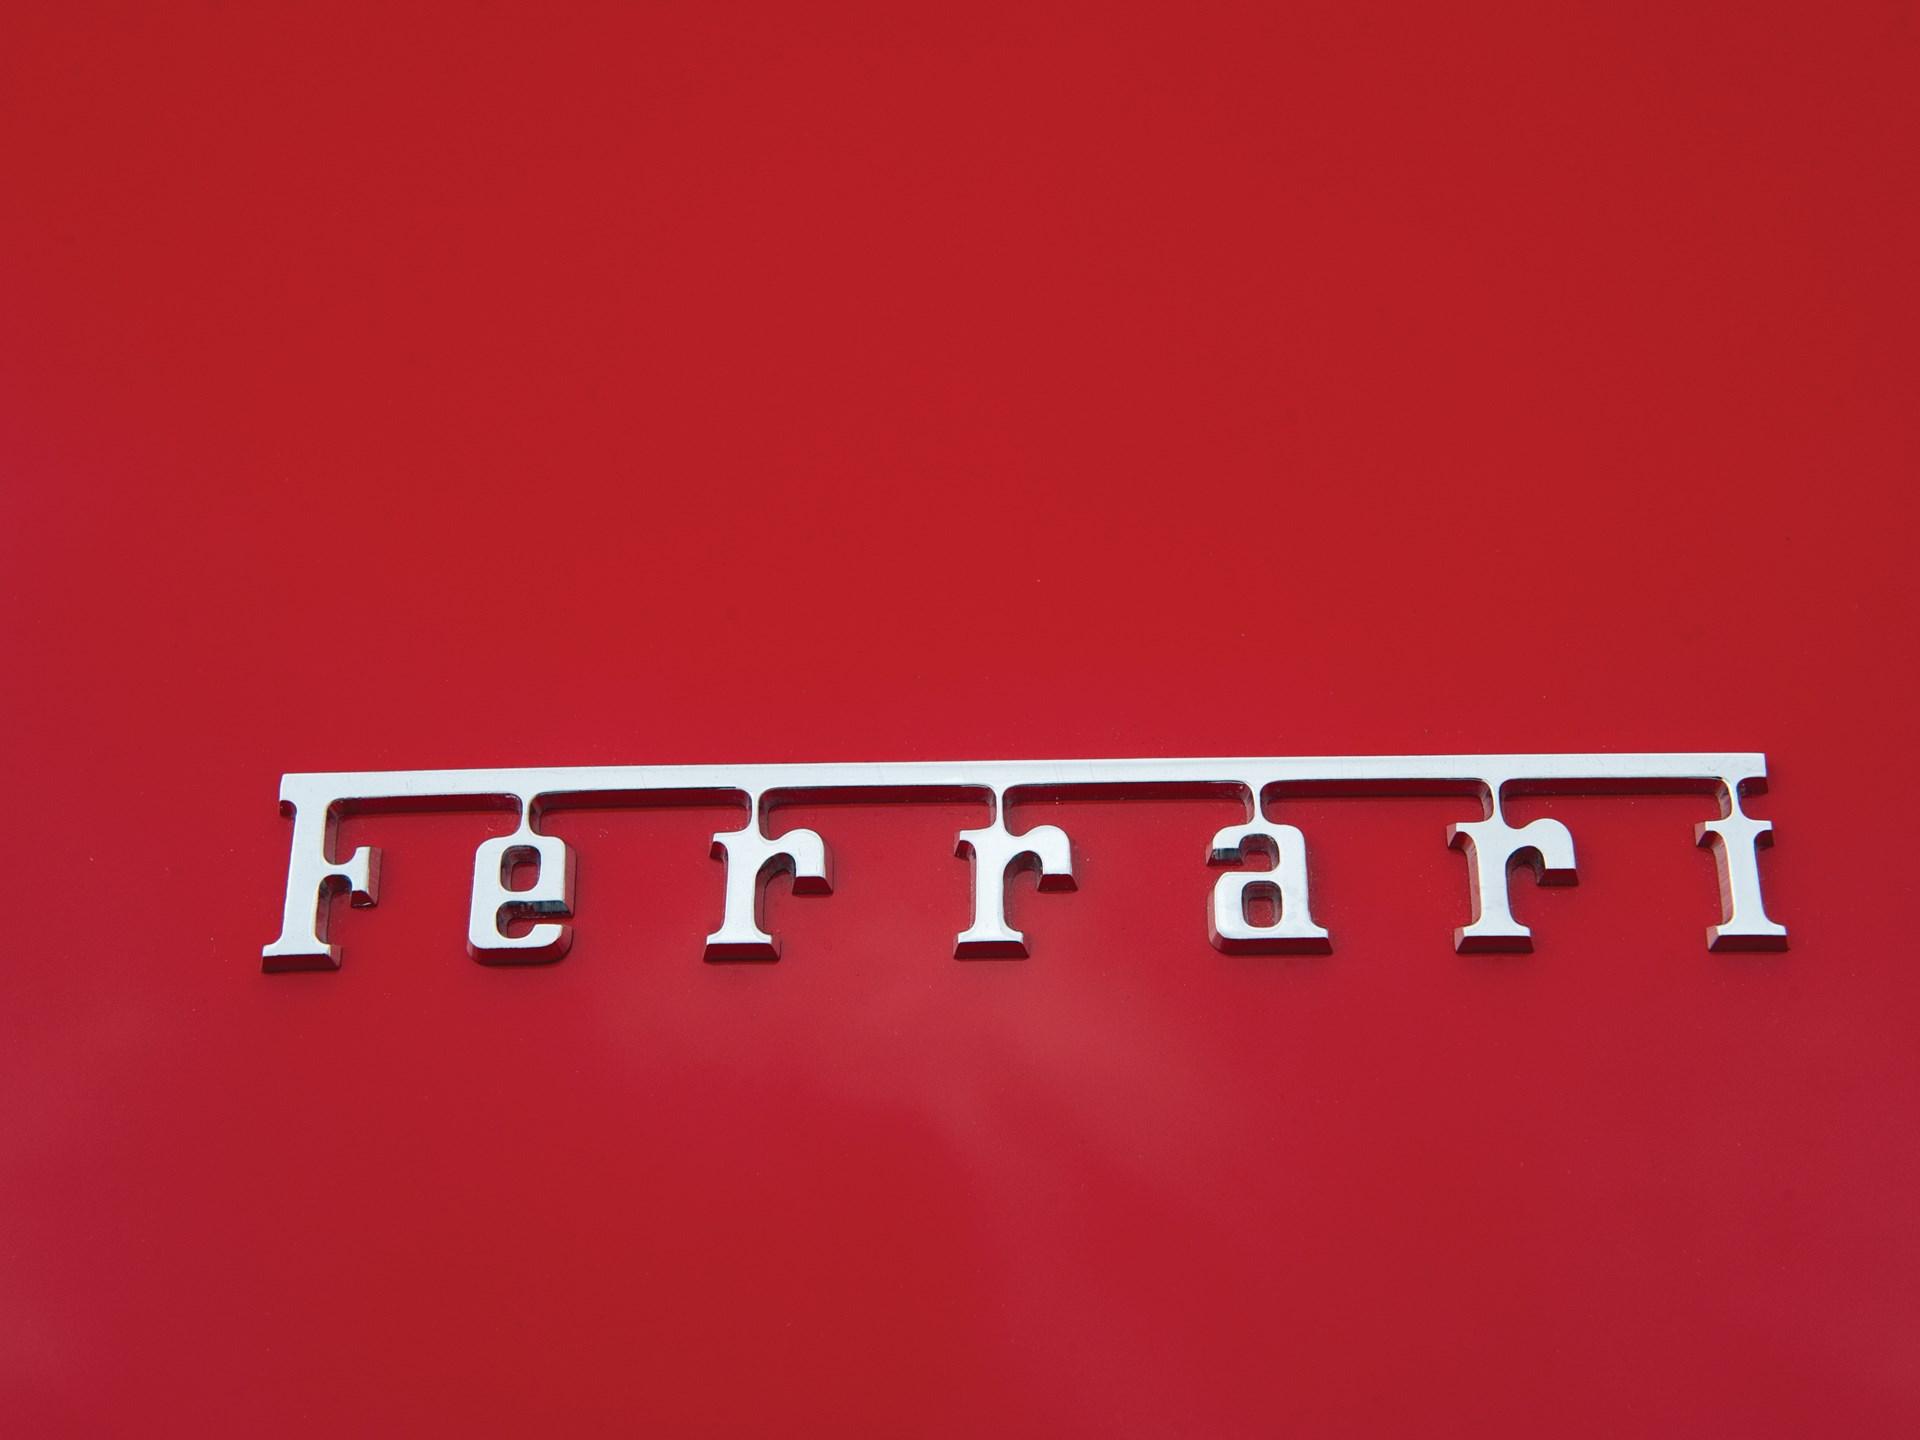 1fb4212857d6 RM Sotheby s - 1973 Ferrari 365 GTB 4 Daytona Berlinetta by ...